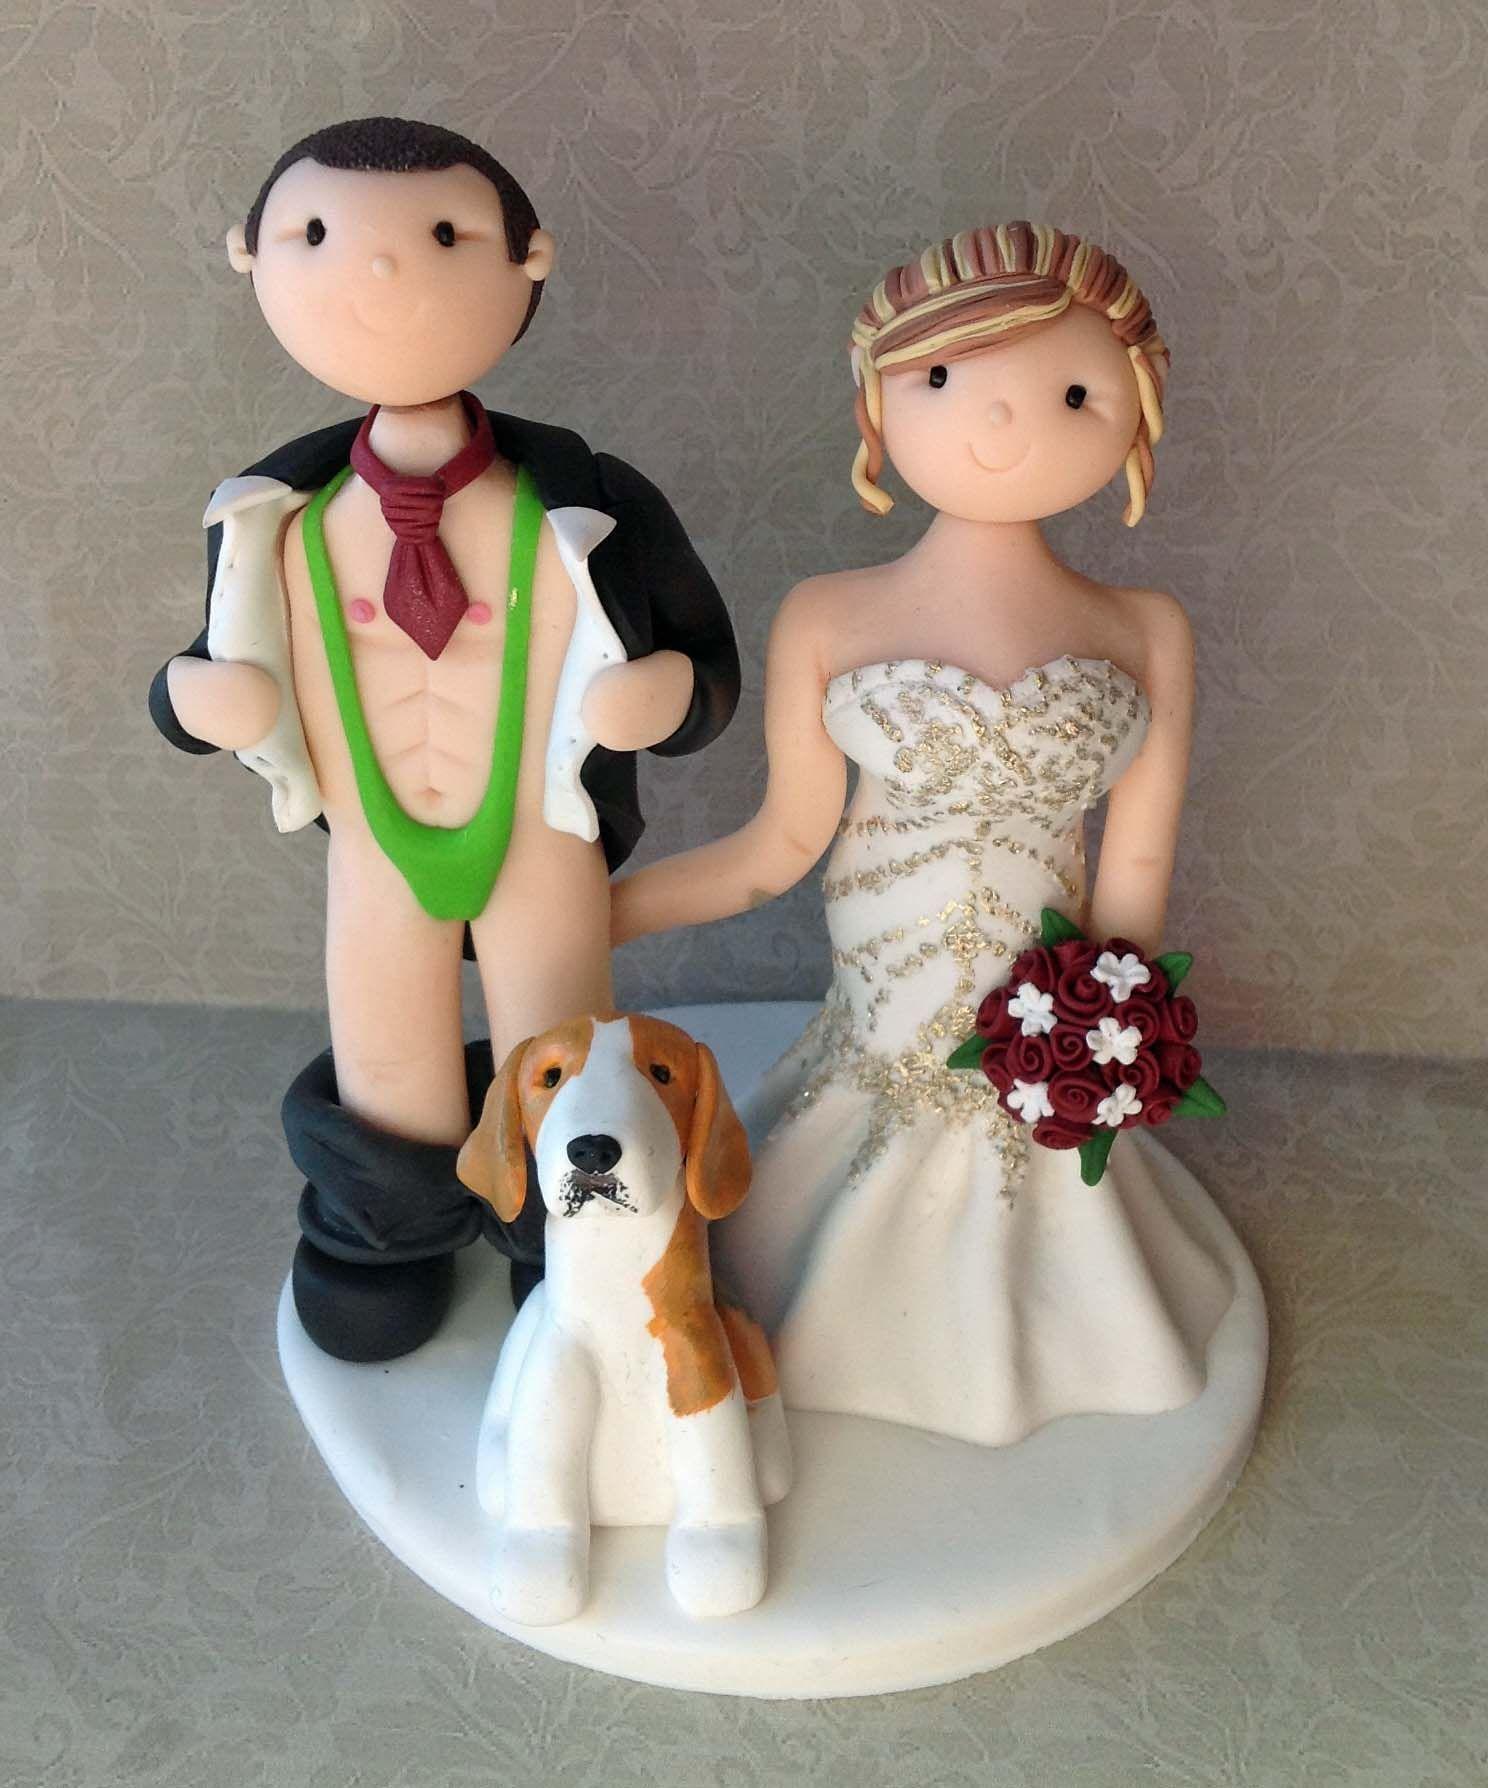 Personalised Wedding Cake Toppers Www Beautifulcaketopper Co Uk